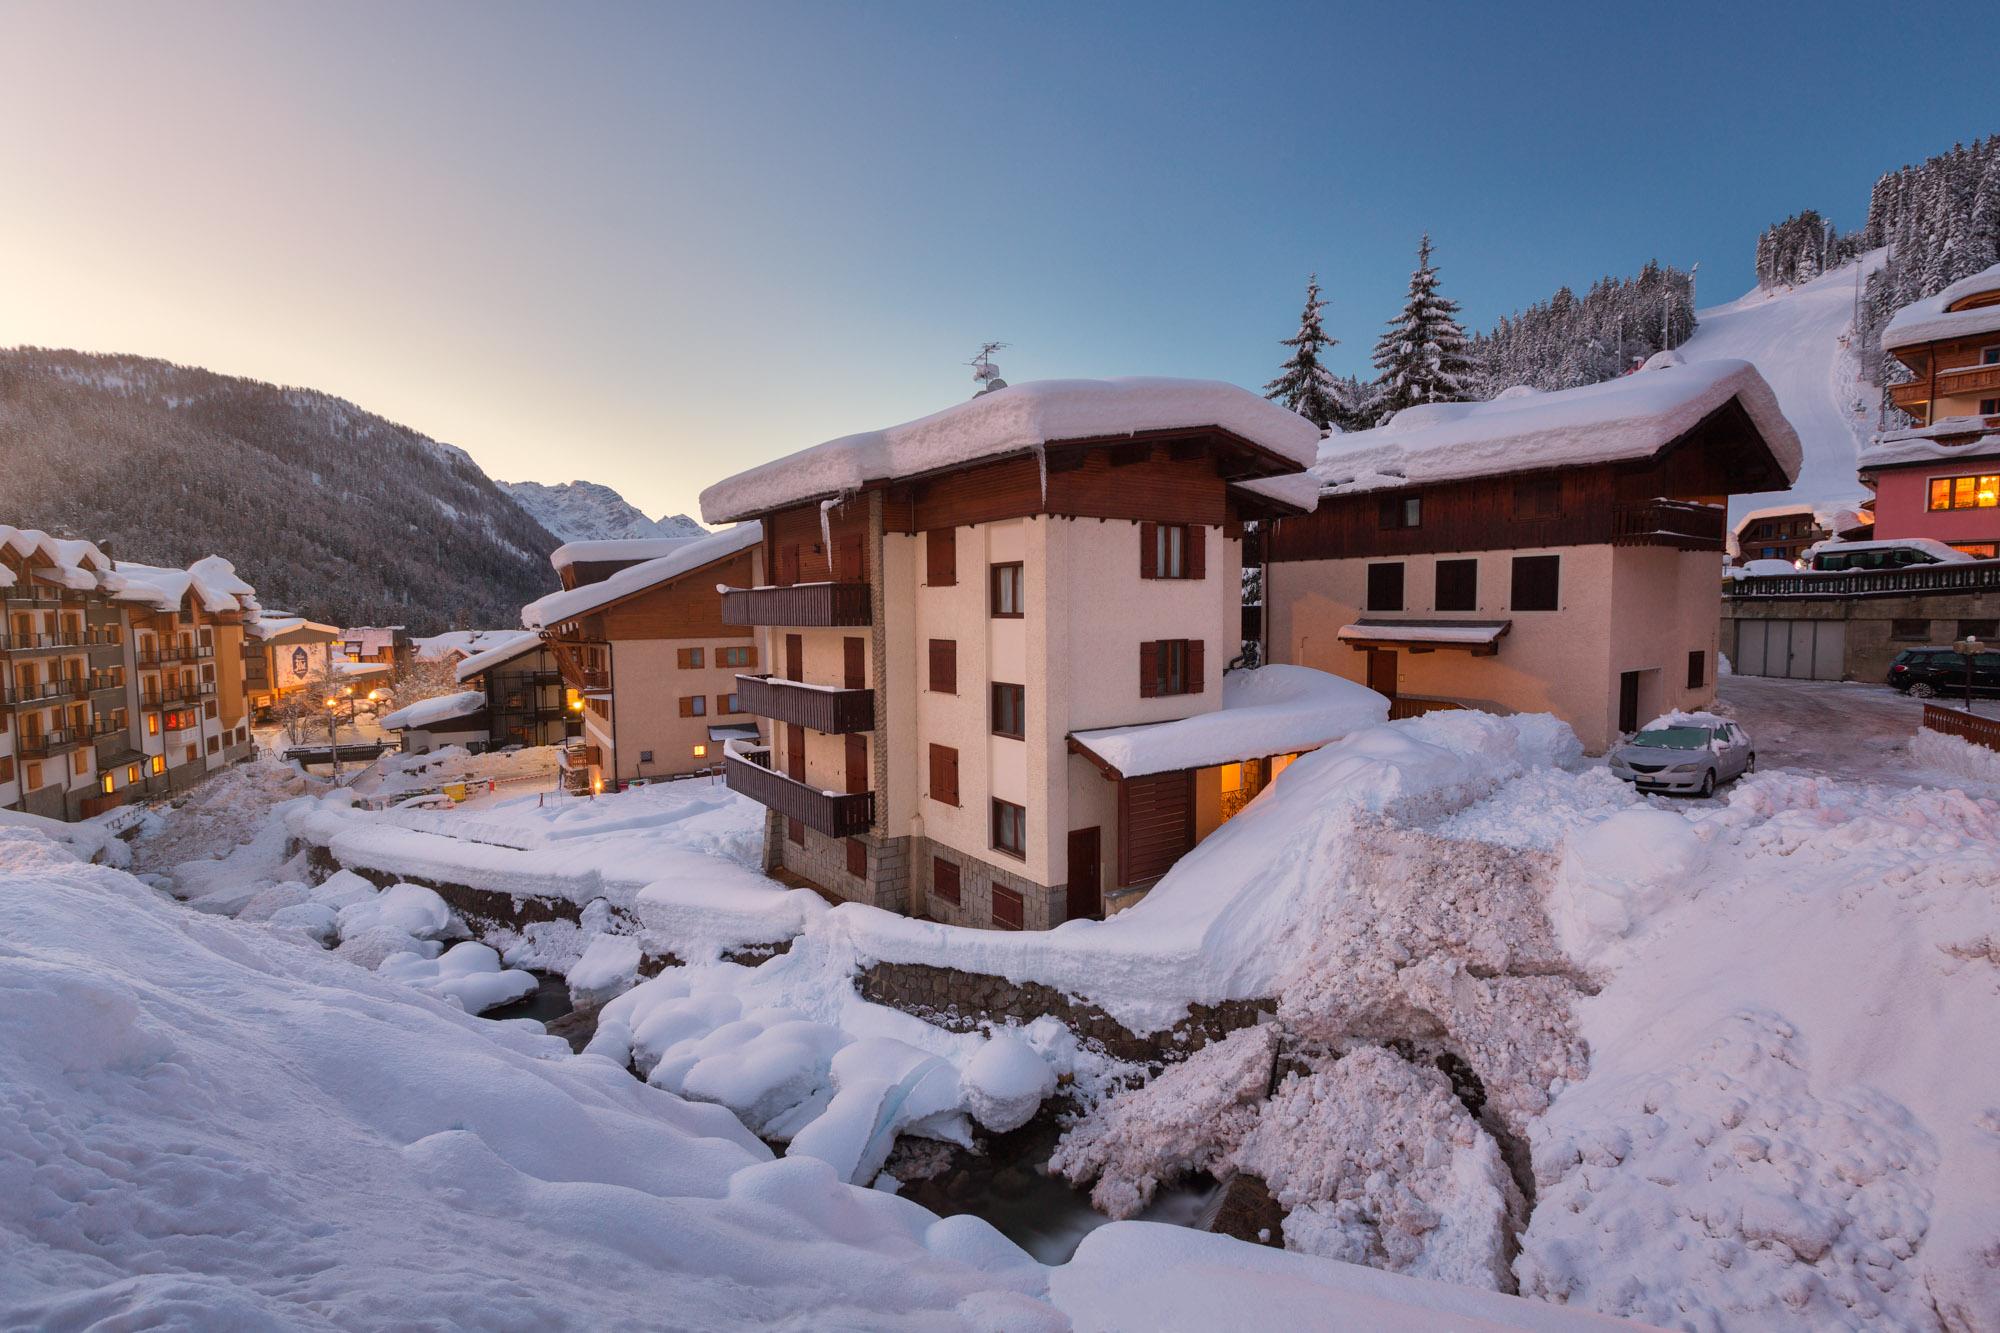 Madonna di Campiglio in the Morning, Brenta Dolomites, Italy